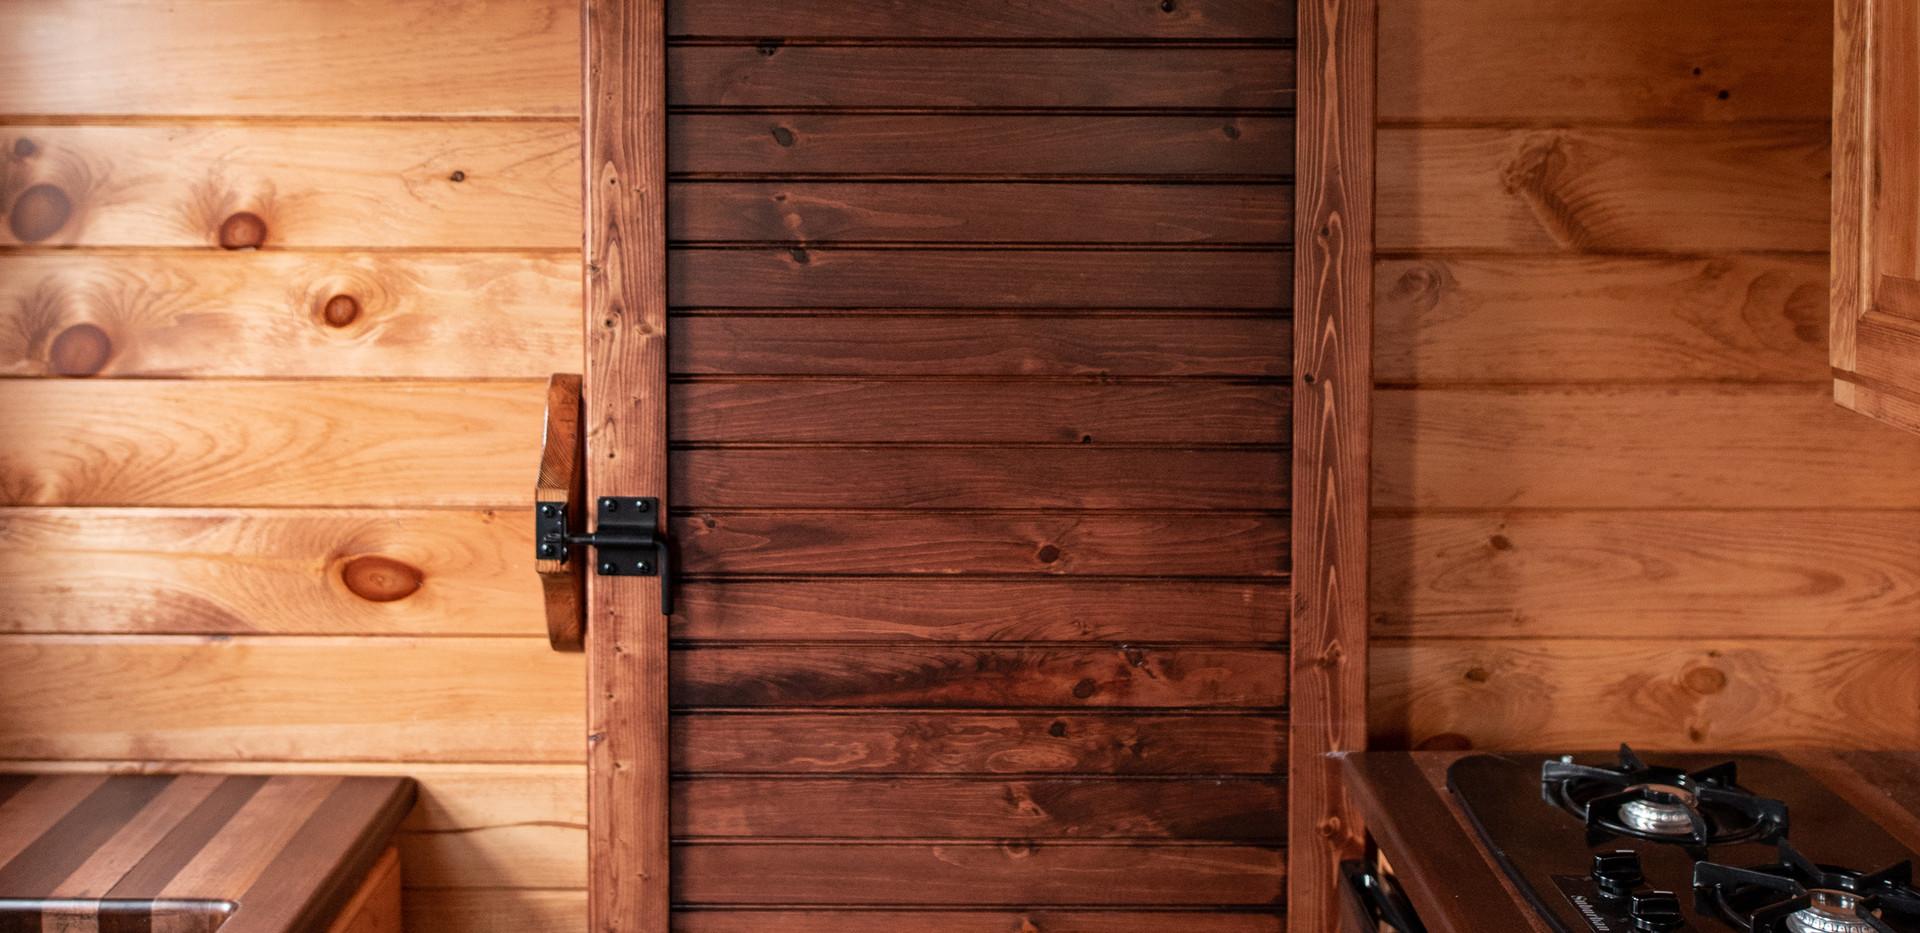 The Lansing Bathroom Barndoor